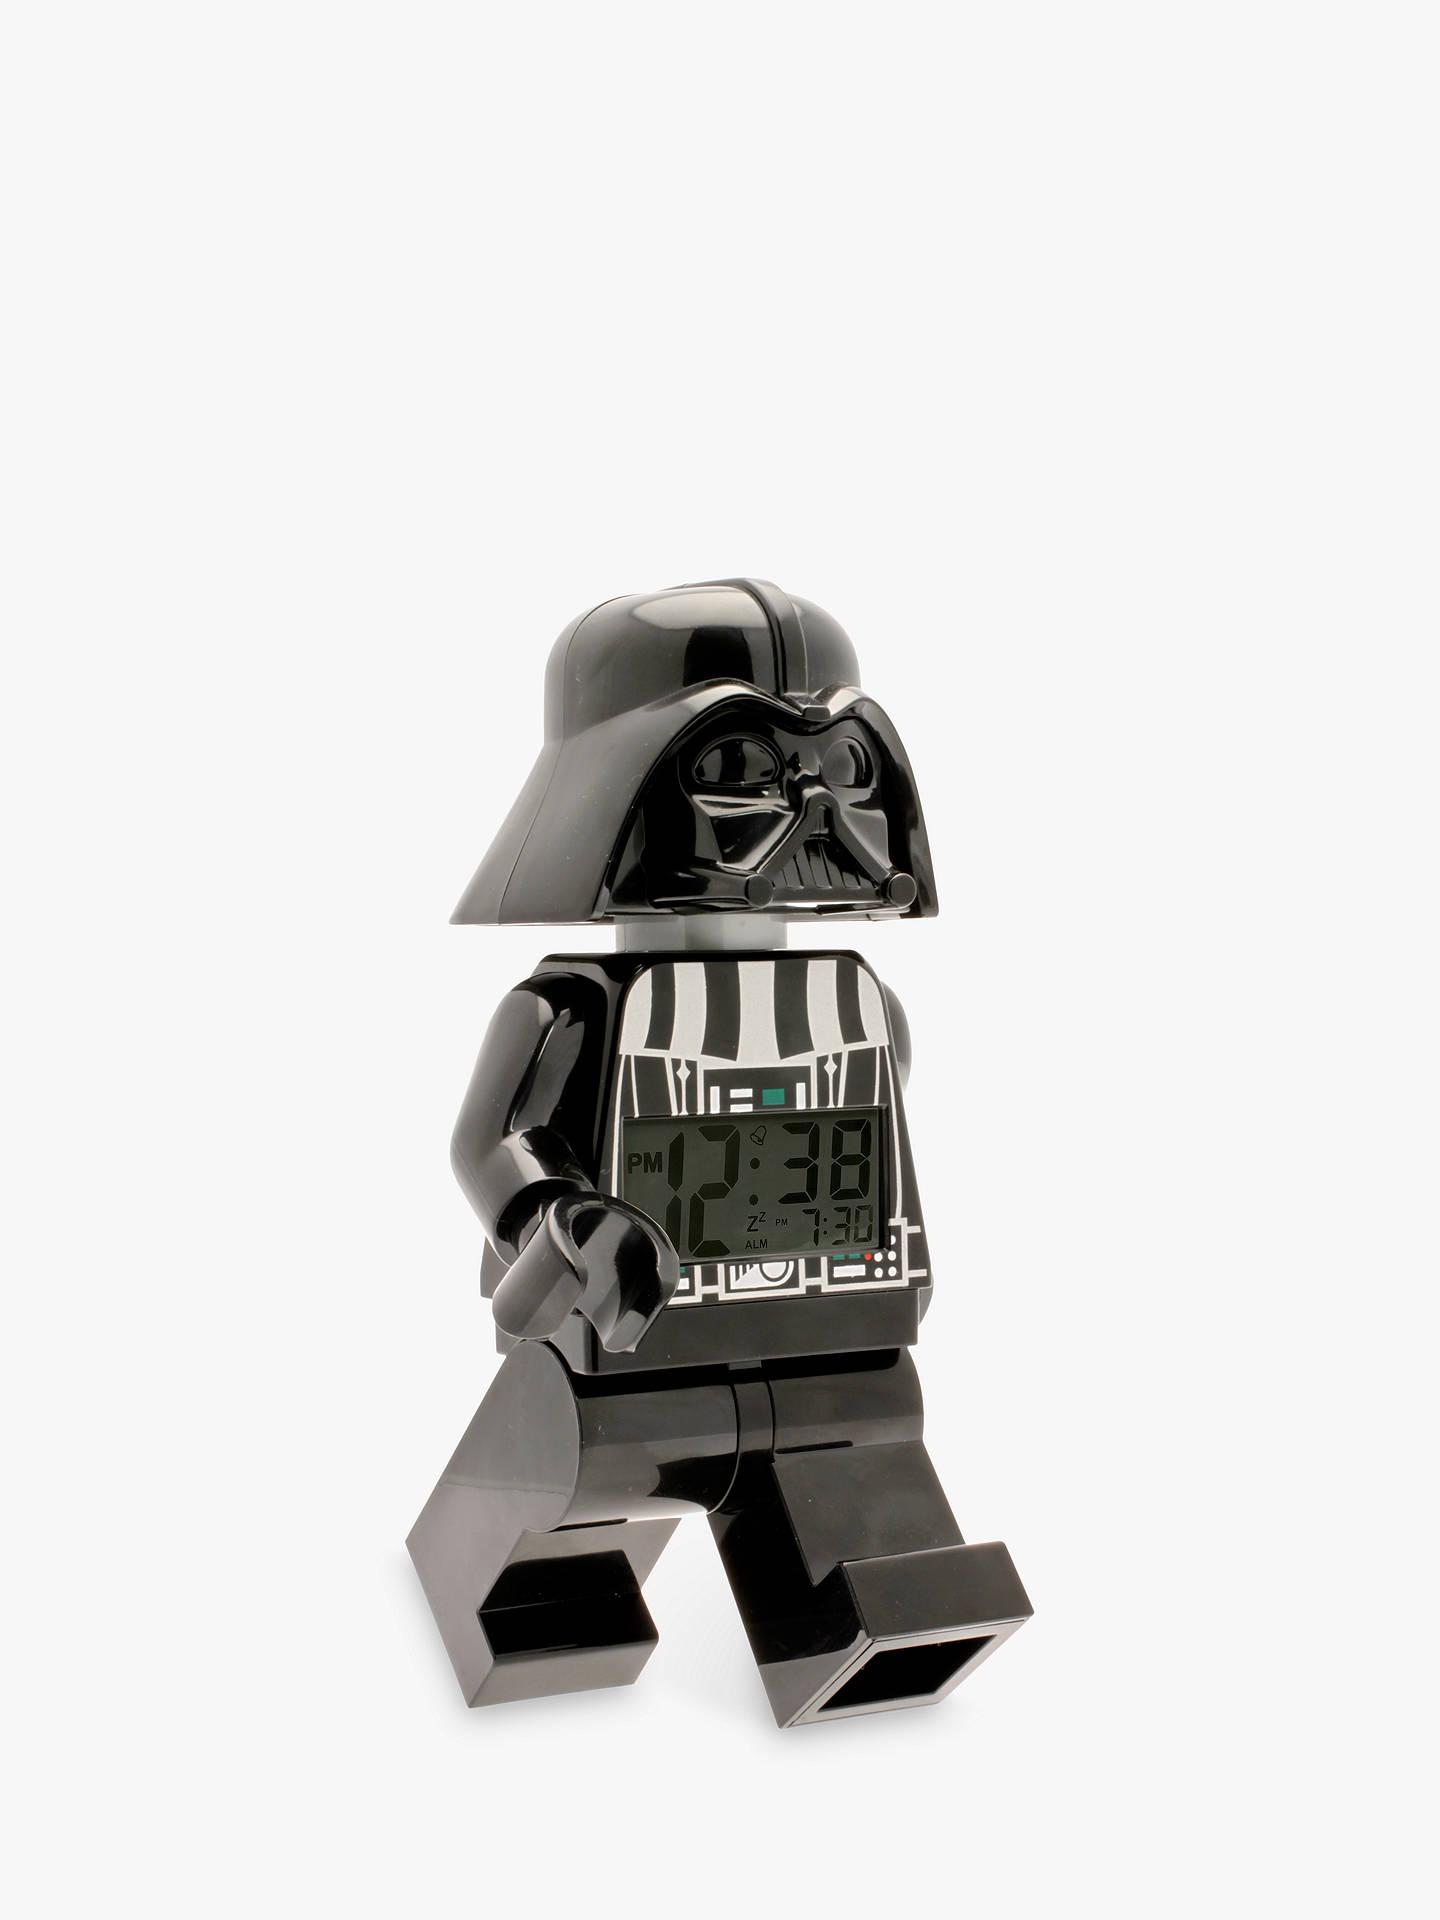 db8a3a89d Buy LEGO Star Wars Darth Vader Alarm Clock Online at johnlewis.com ...